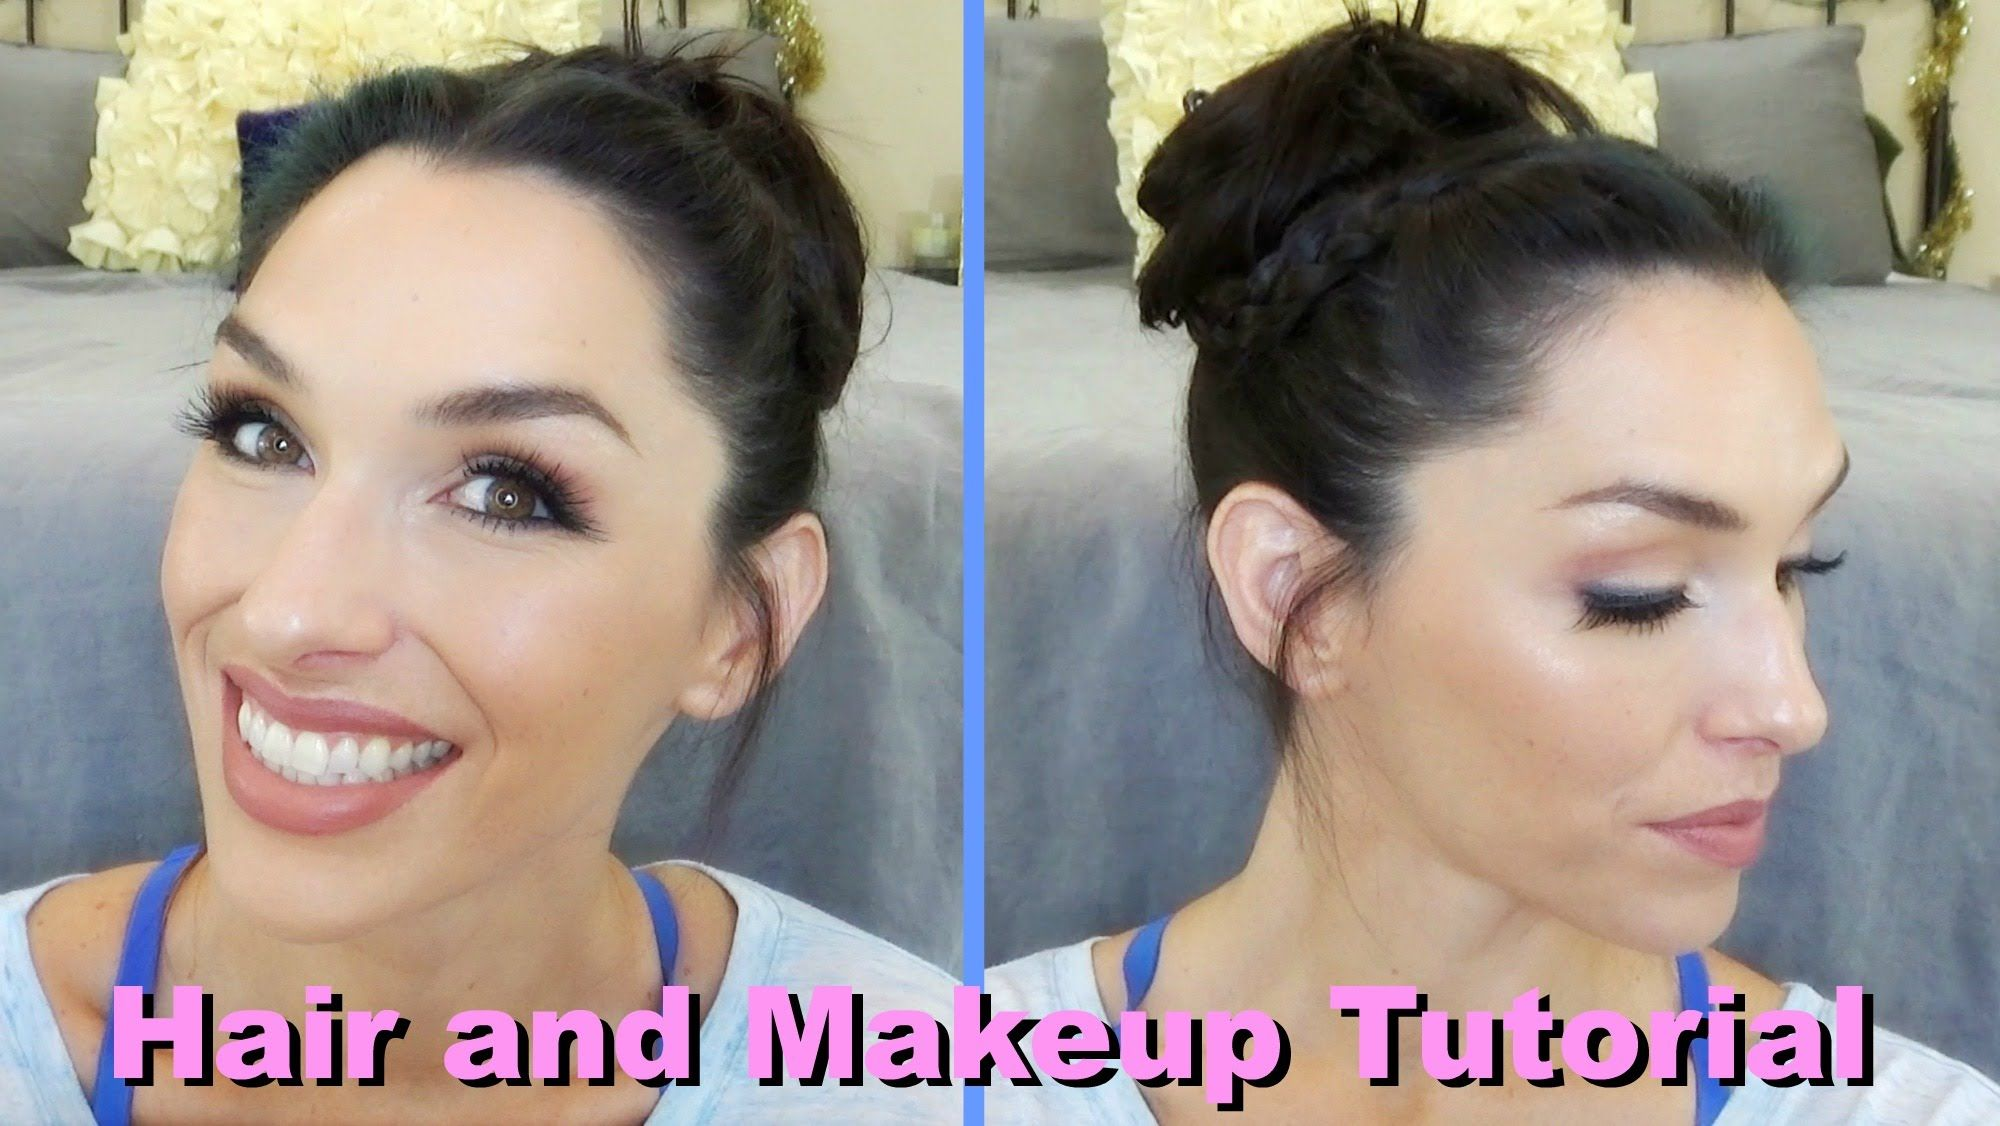 Full Face Summer Makeup and Hair Tutorial